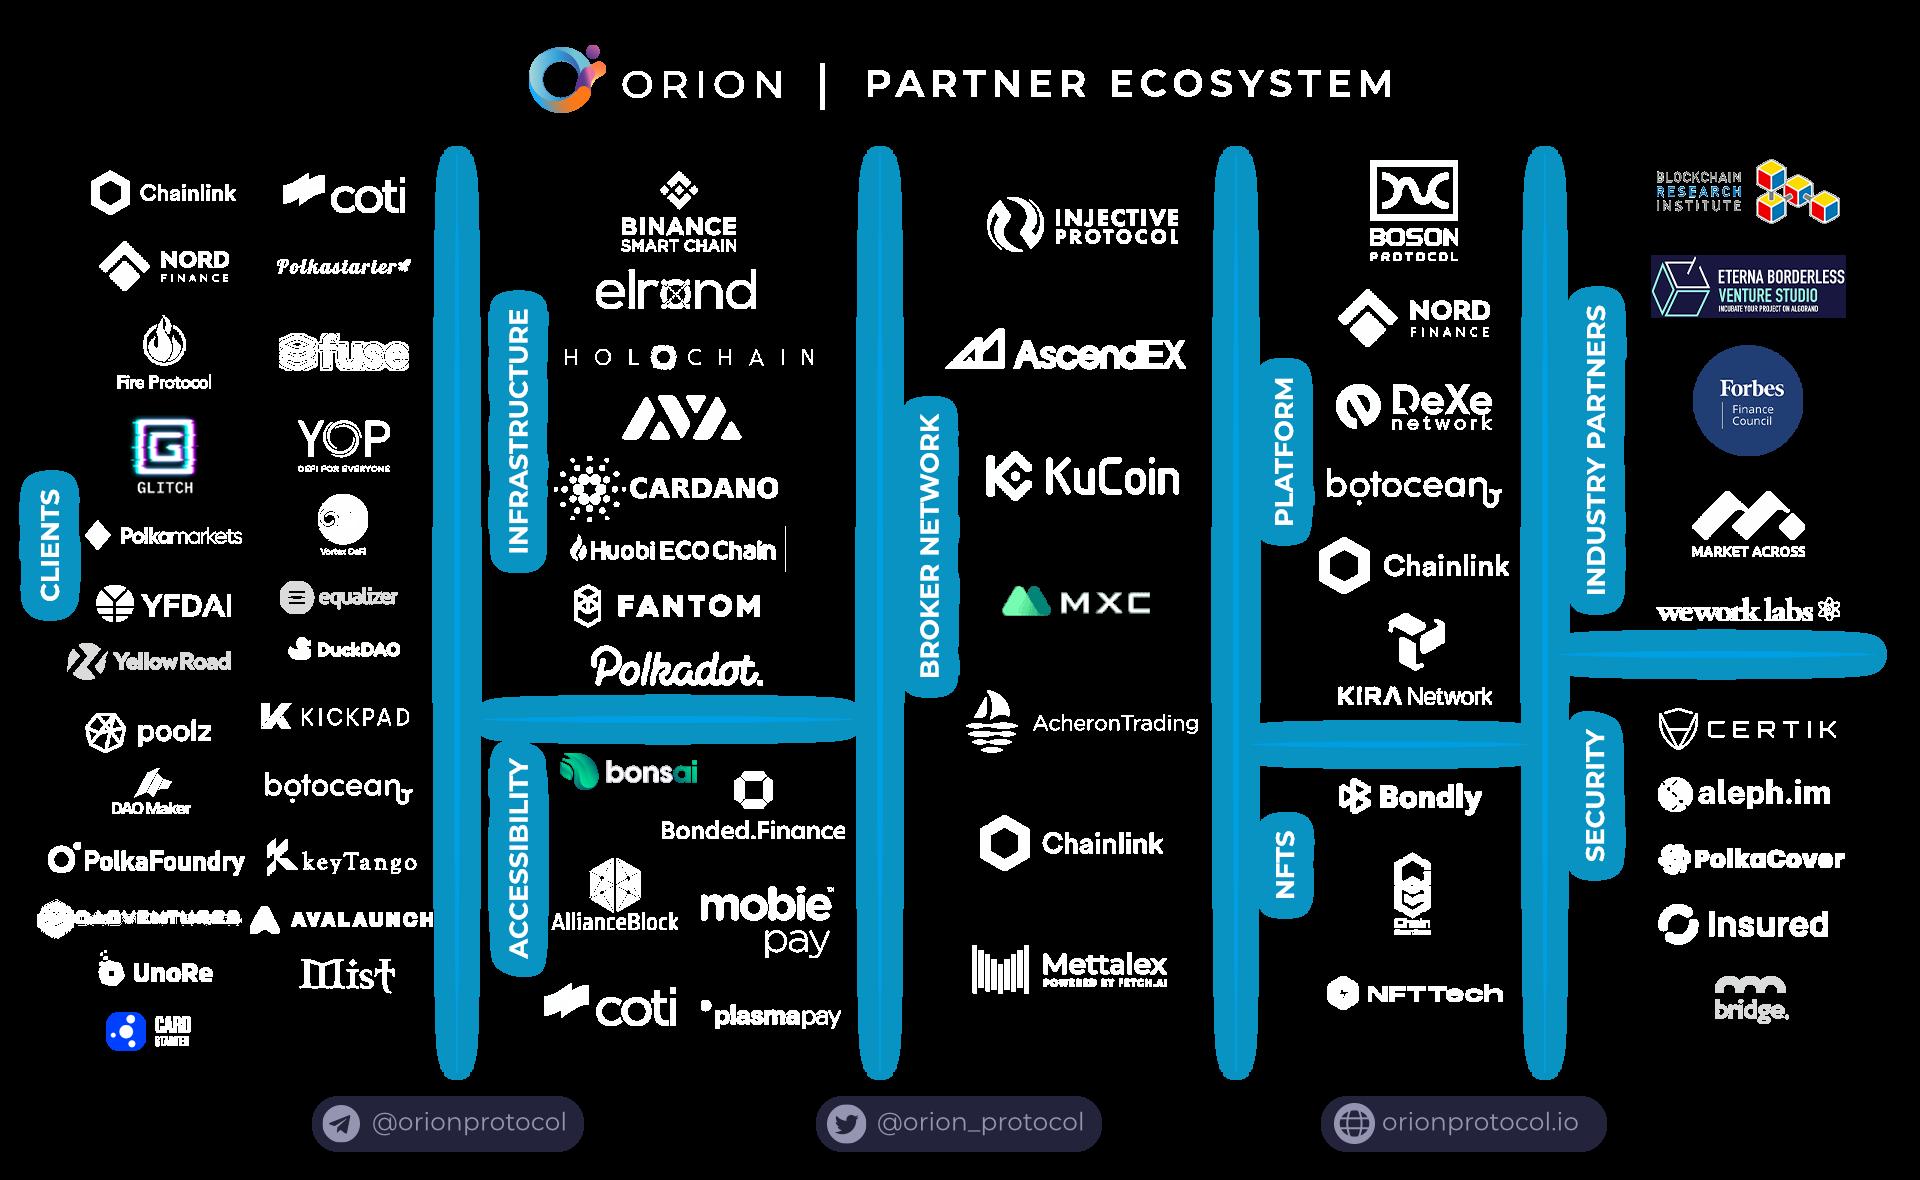 Partnership Ecosystem 08.05.21 clear